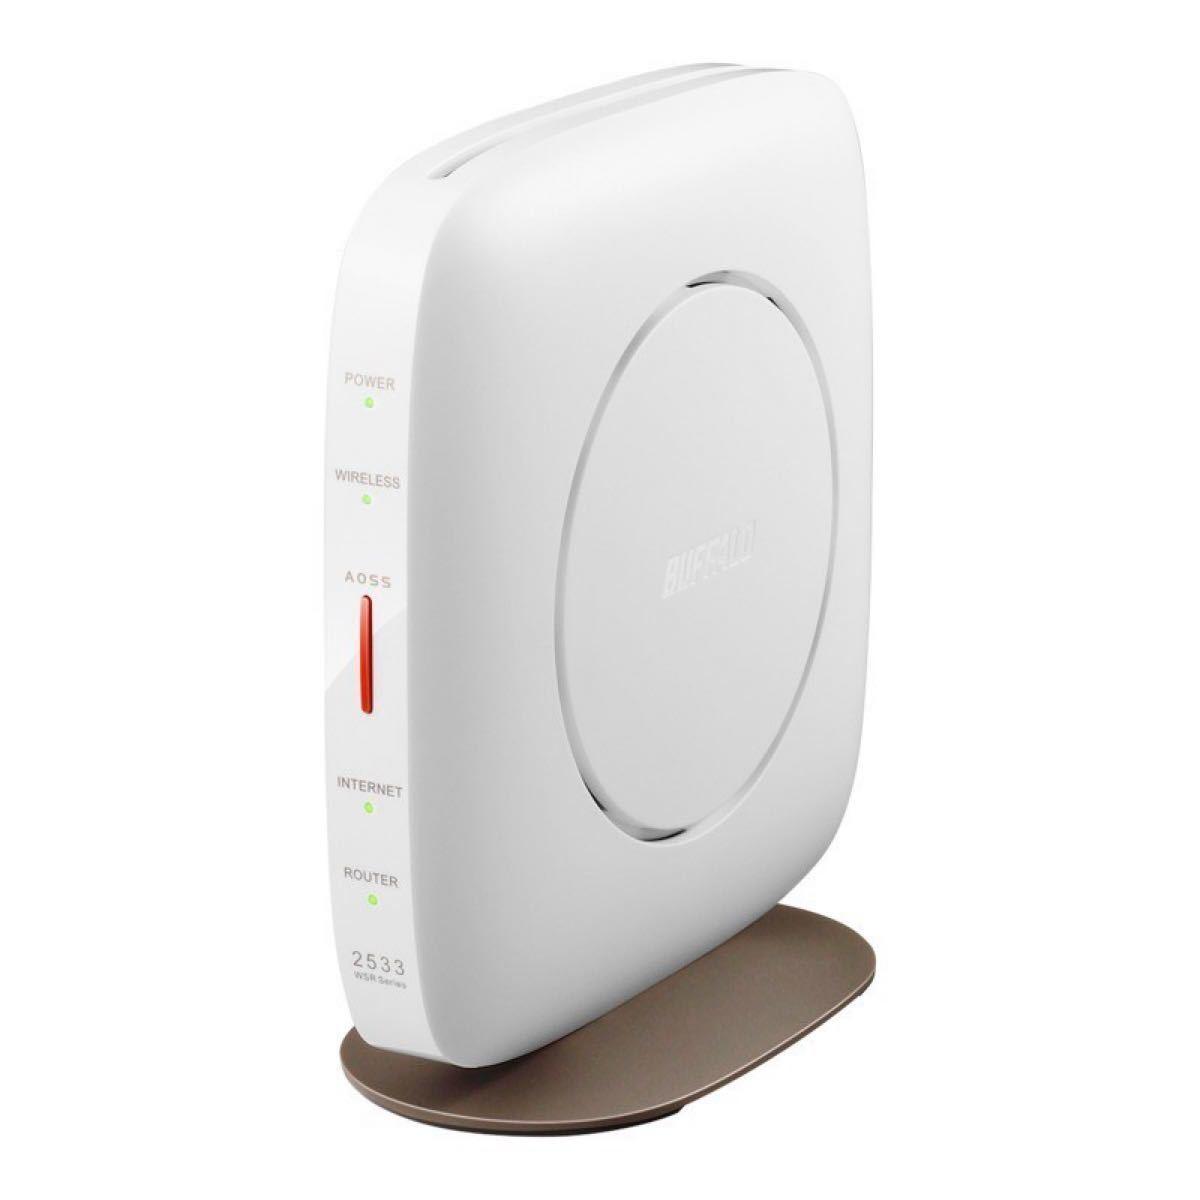 BUFFALO 無線LAN親機 WSR-2533DHP3-WH ホワイト Wi-Fiルーター  エアステーション 11ac対応